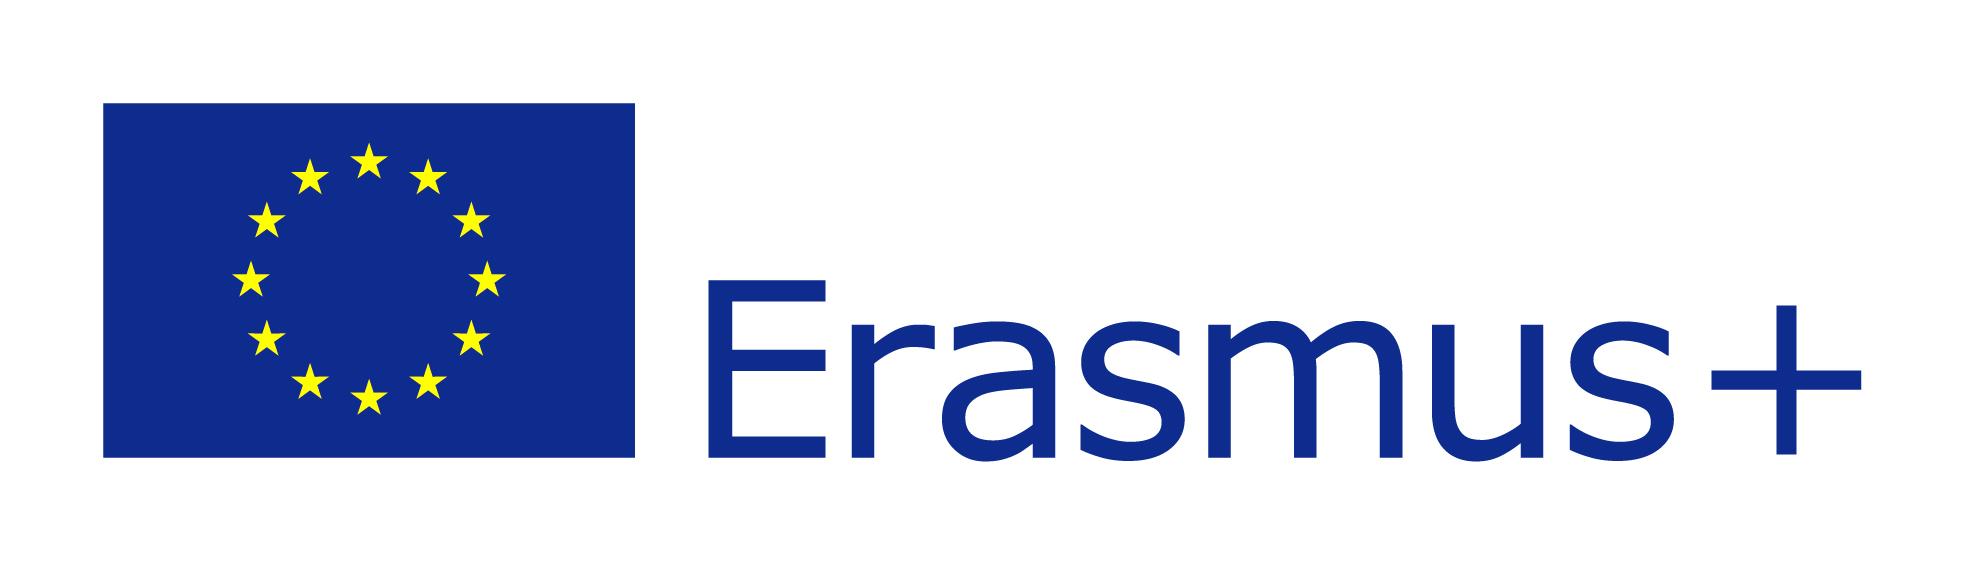 EU flag-Erasmus+_vect_POS